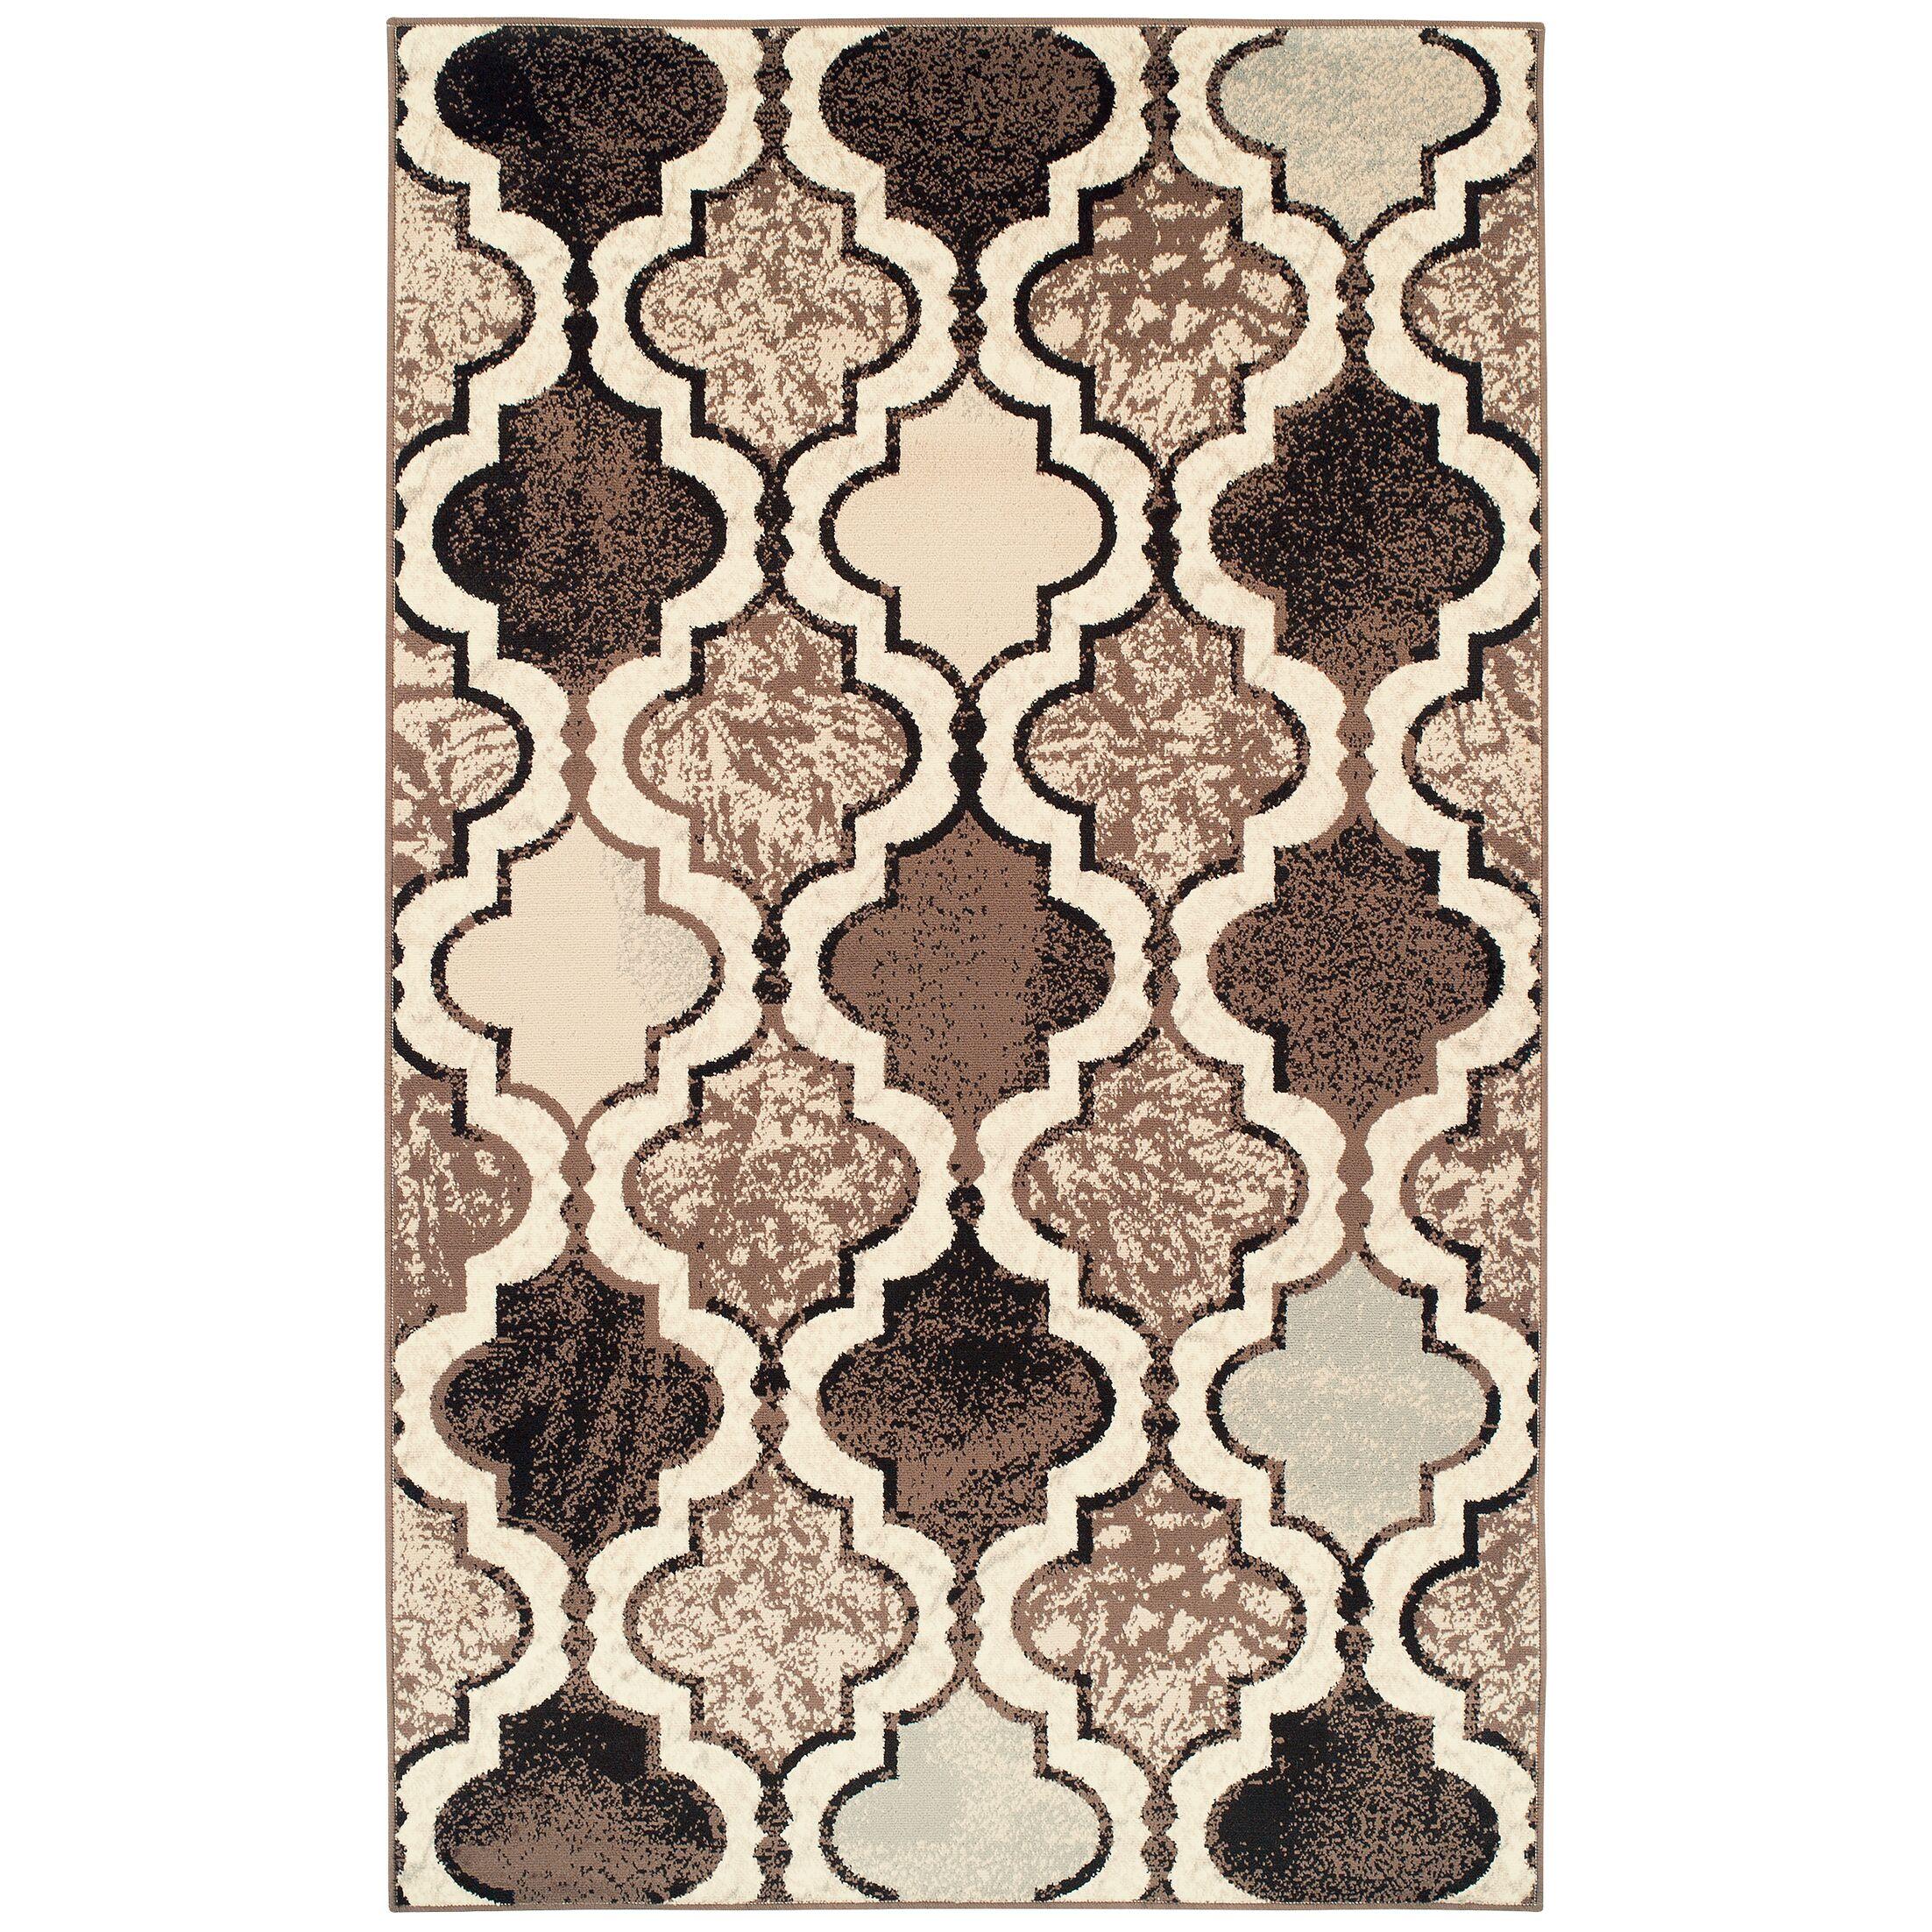 Lamoille Trellis Beige/Brown Area Rug Rug Size: Rectangle 8' x 10'